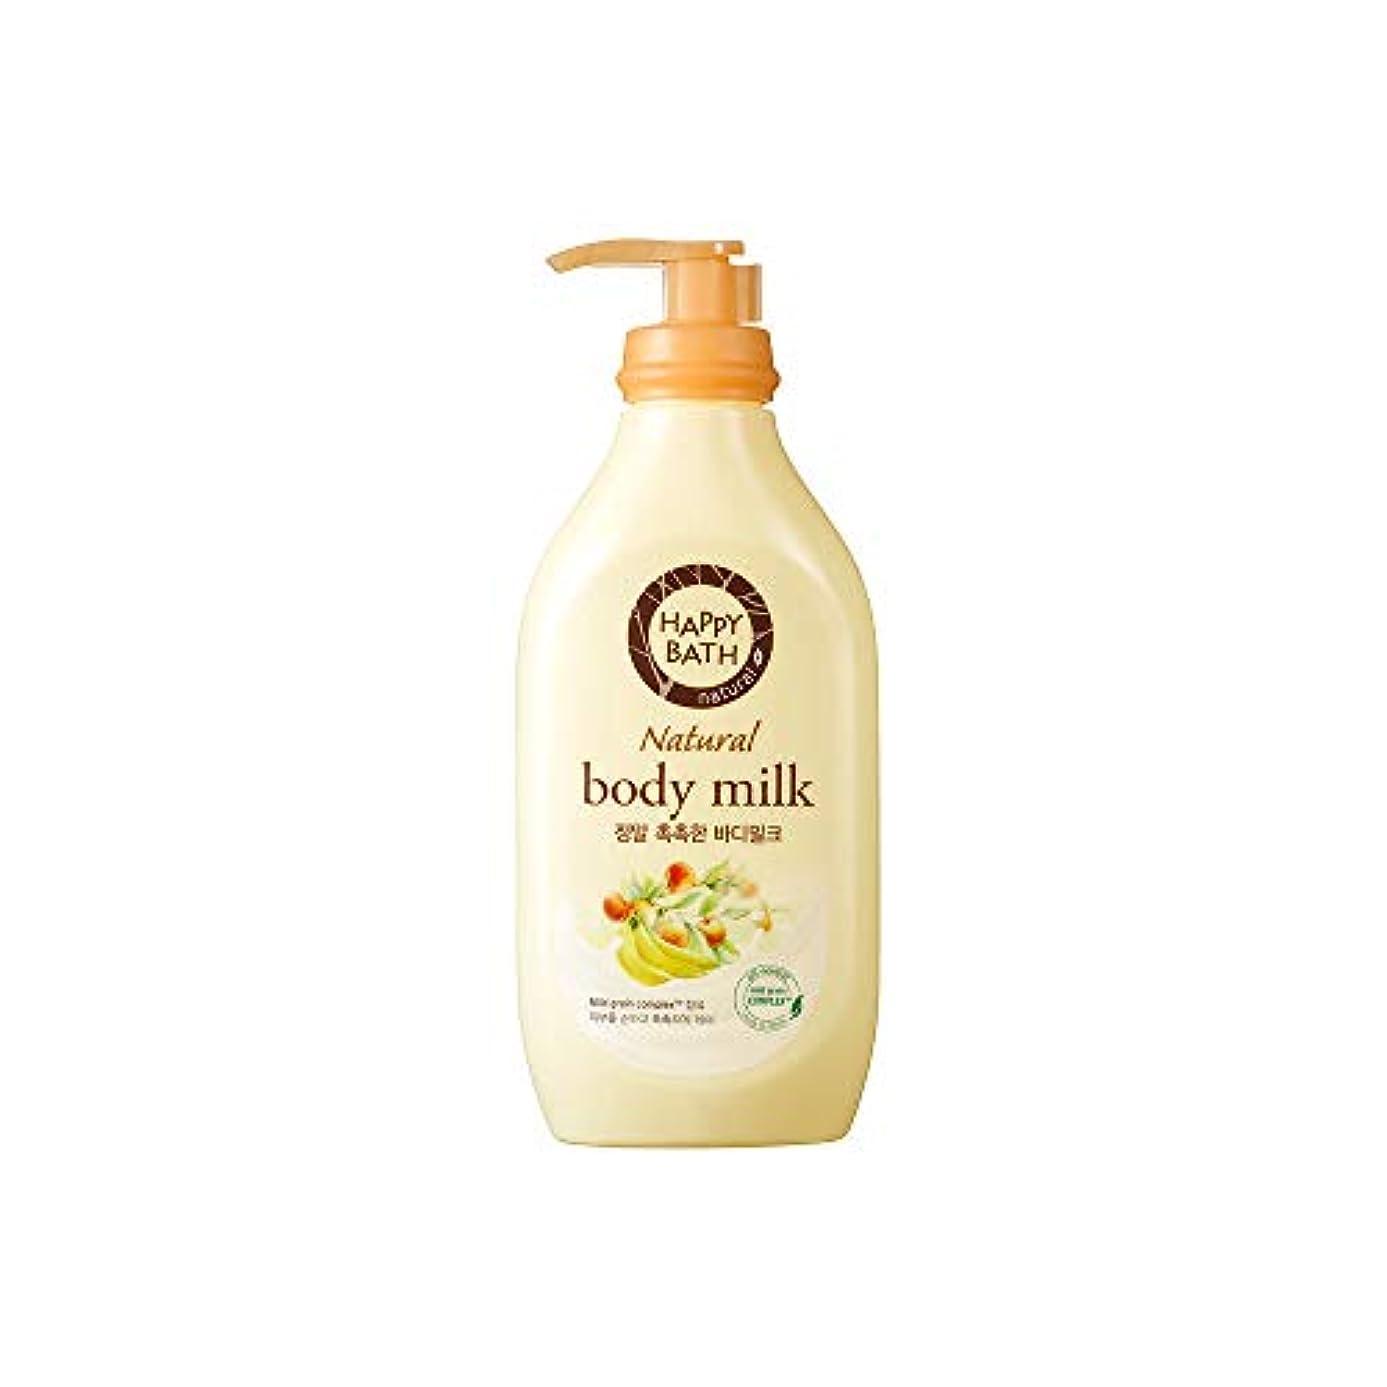 [HAPPY BATH] ハッピーバス ナチュラルボディミルク しっとりタイプ ボディローション 450ml (moisture body milk 450ml)